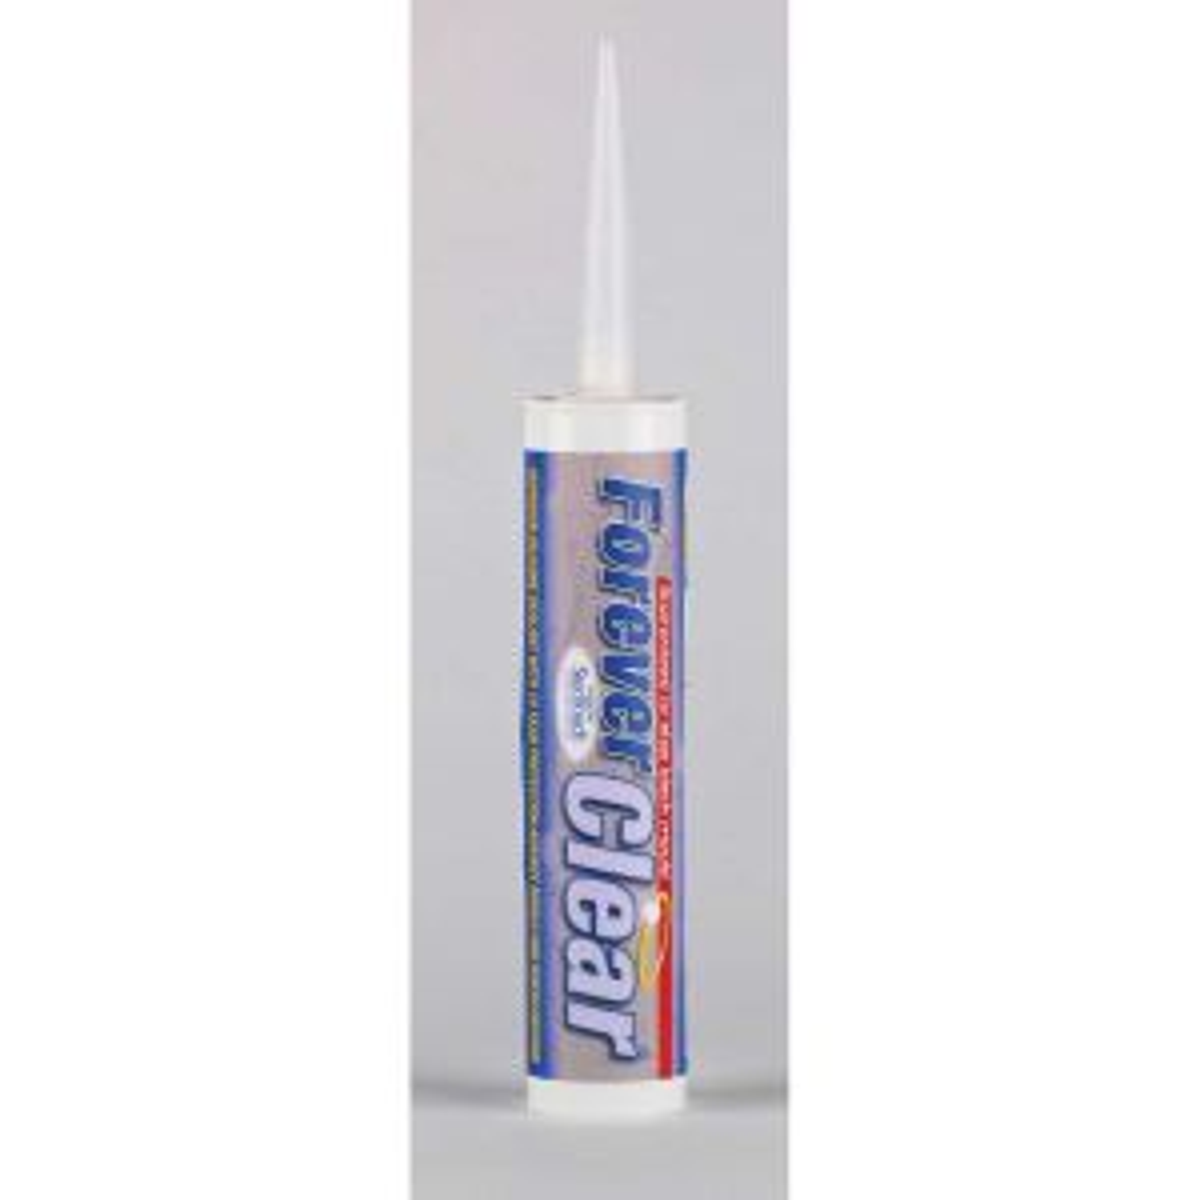 Forever Clear Bathroom Sealant